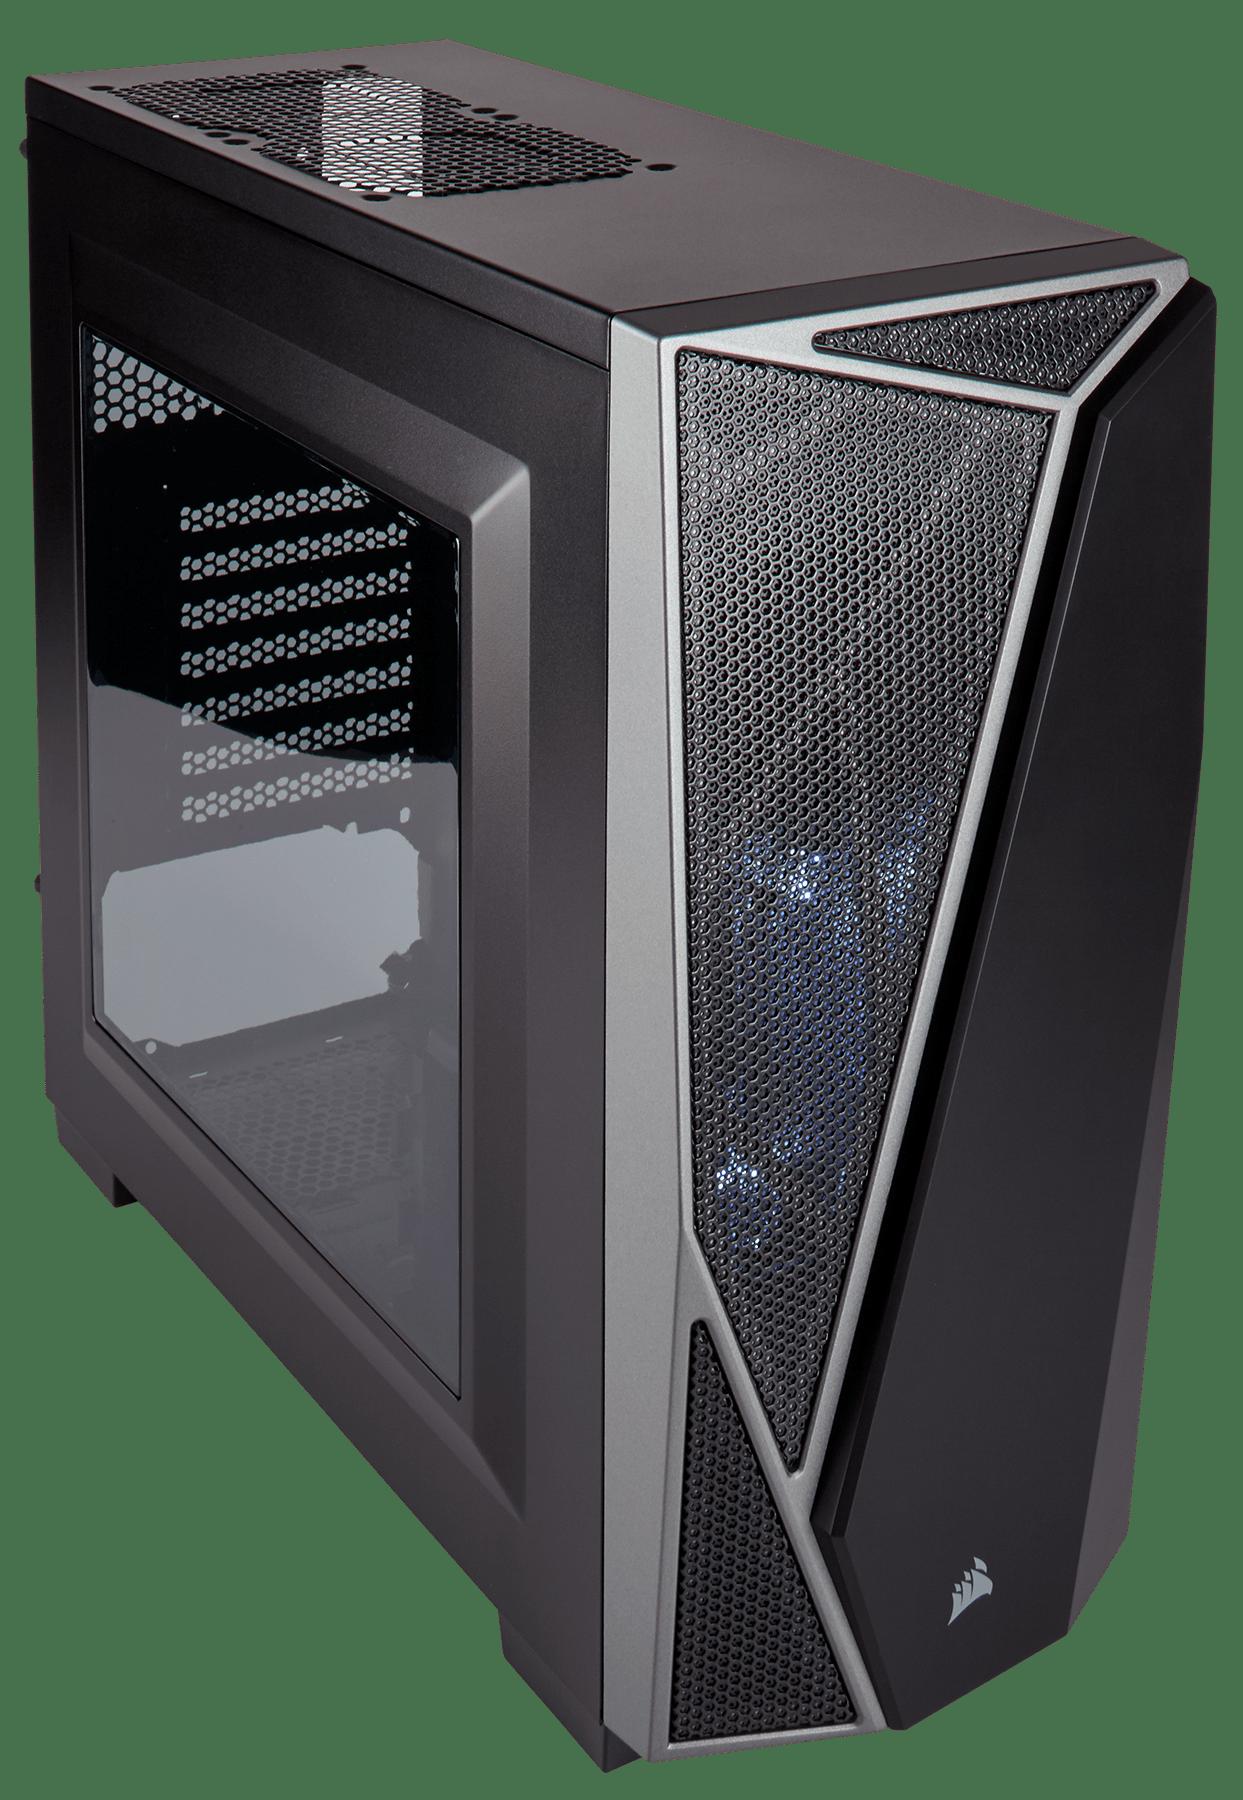 Corsair Carbide Series Mid-Tower Gaming Case | Canada Computers